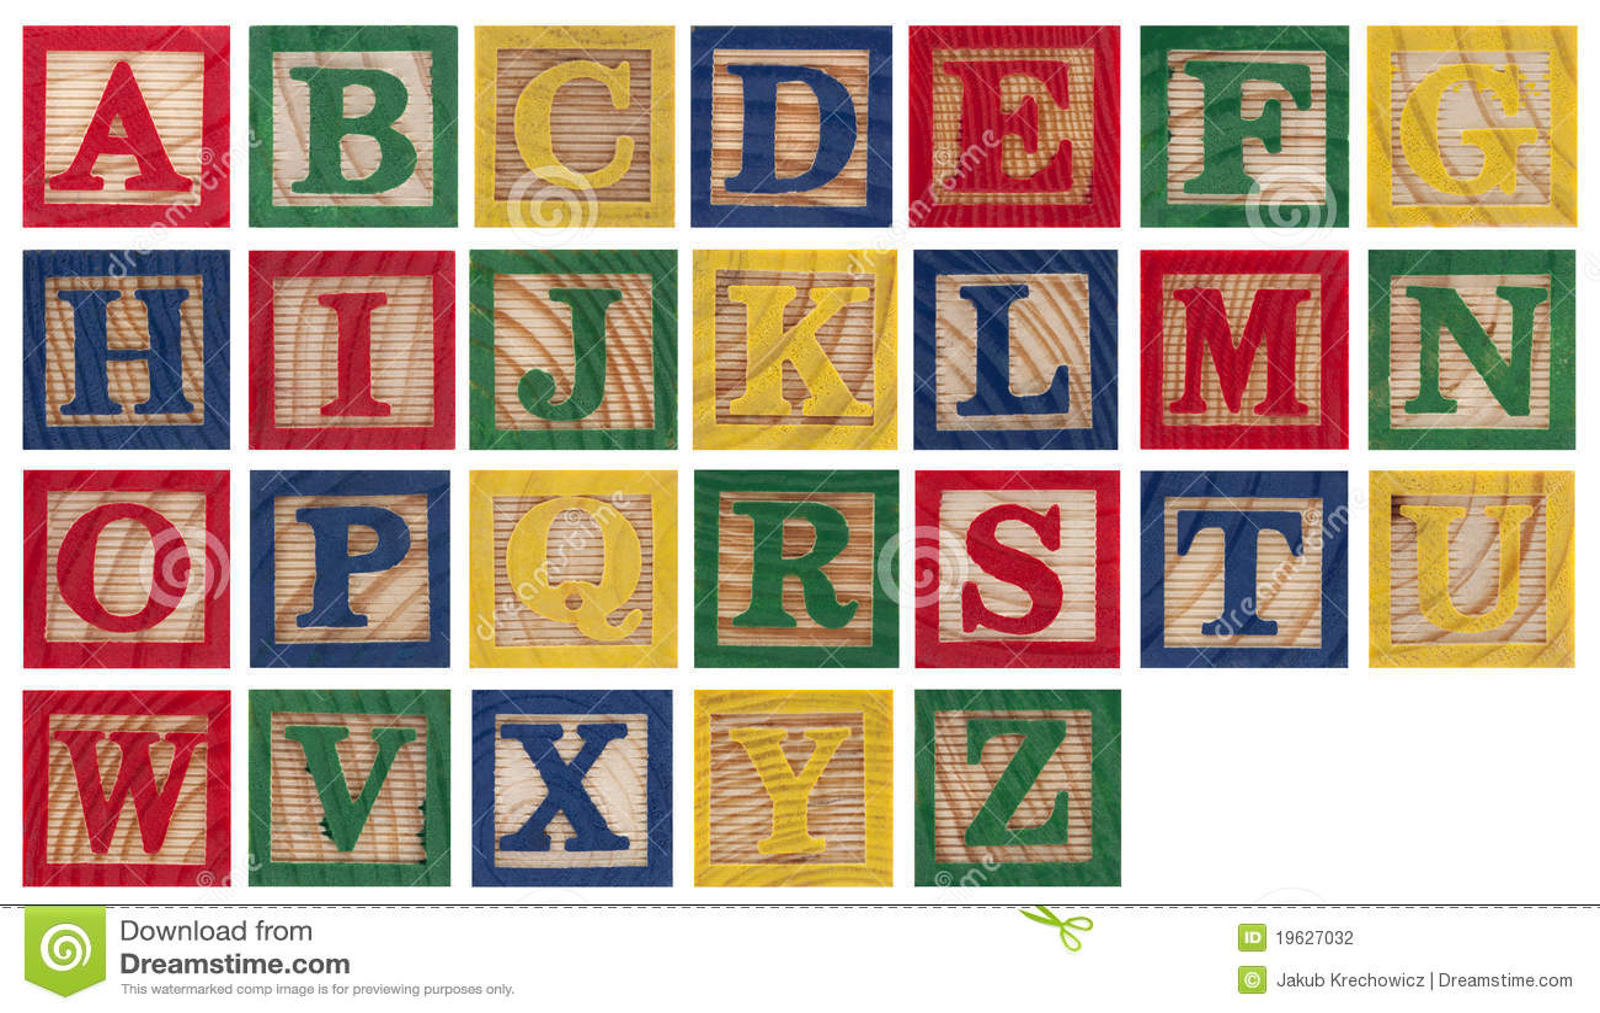 Wooden Alphabet Blocks Font  LektonInfo